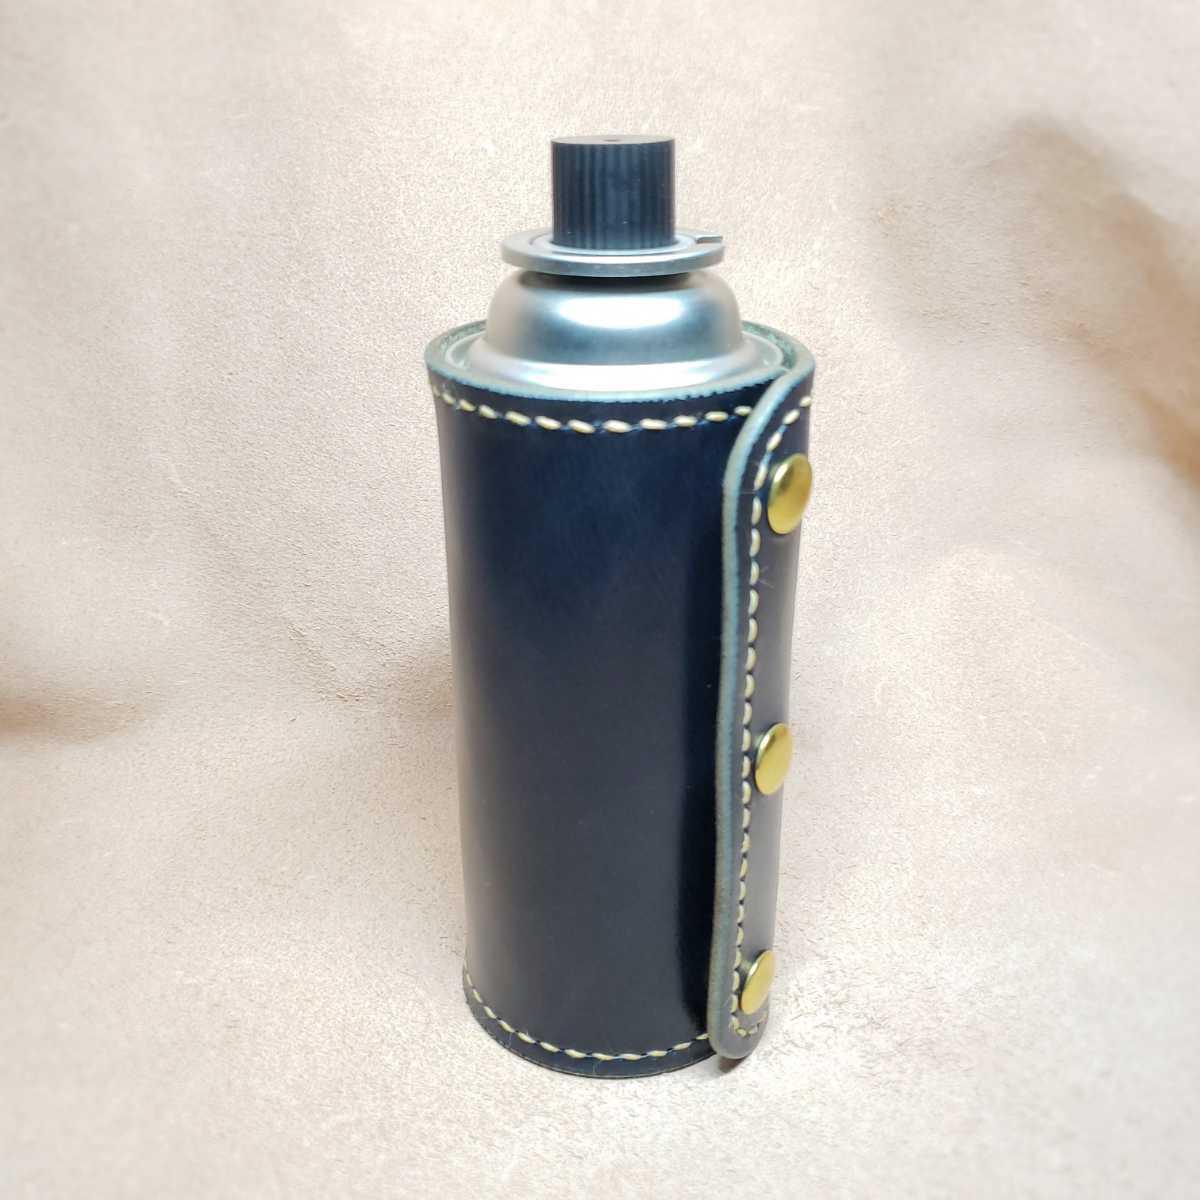 CB缶カバー(カセットボンベ) 栃木レザー 丘染めネイビーヌメ革 3.5ミリ厚